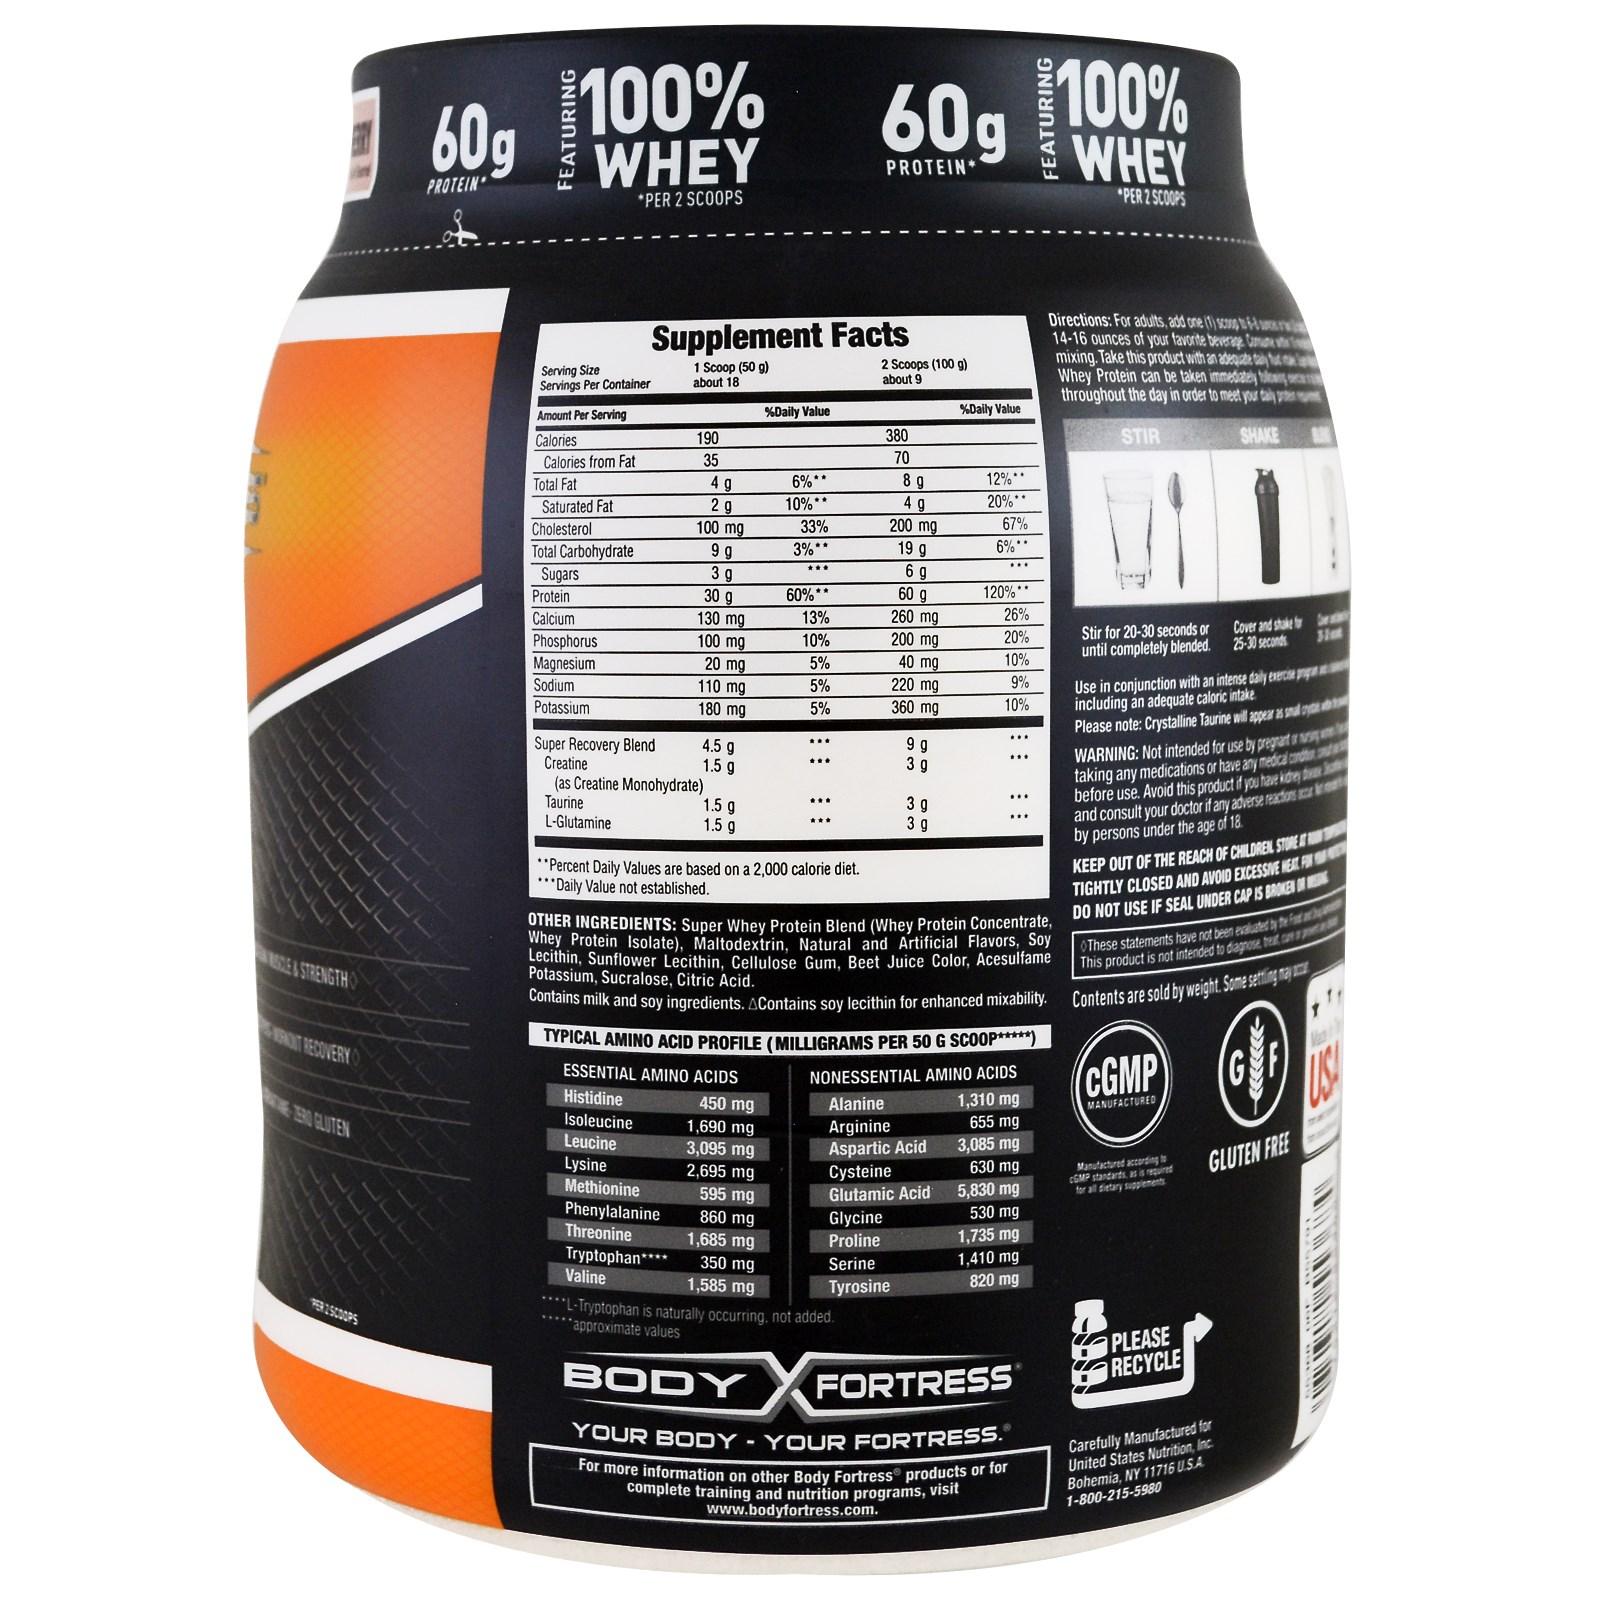 Body Fortress Super Advanced Whey Protein Powder Chocolate 2 Lb